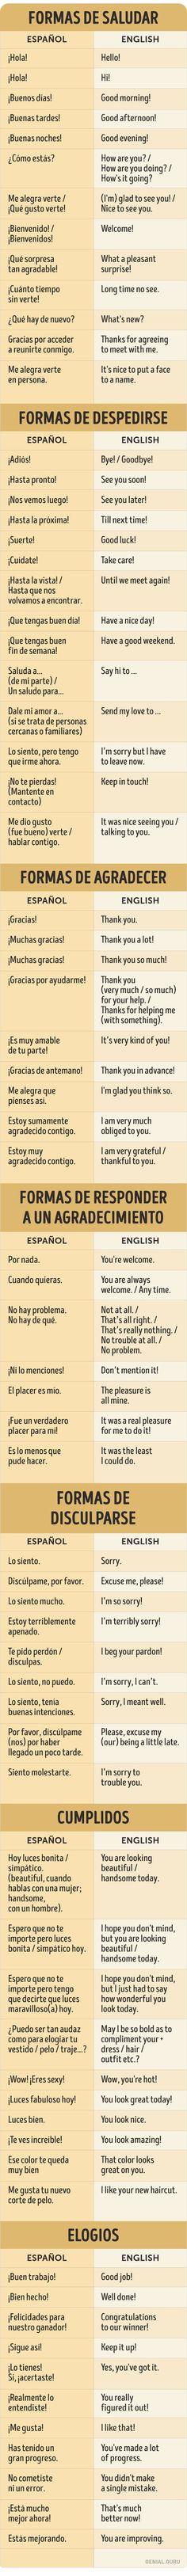 Nereida Nieves (gar_nieves21) on Pinterest - fresh tabla periodica hecha en word